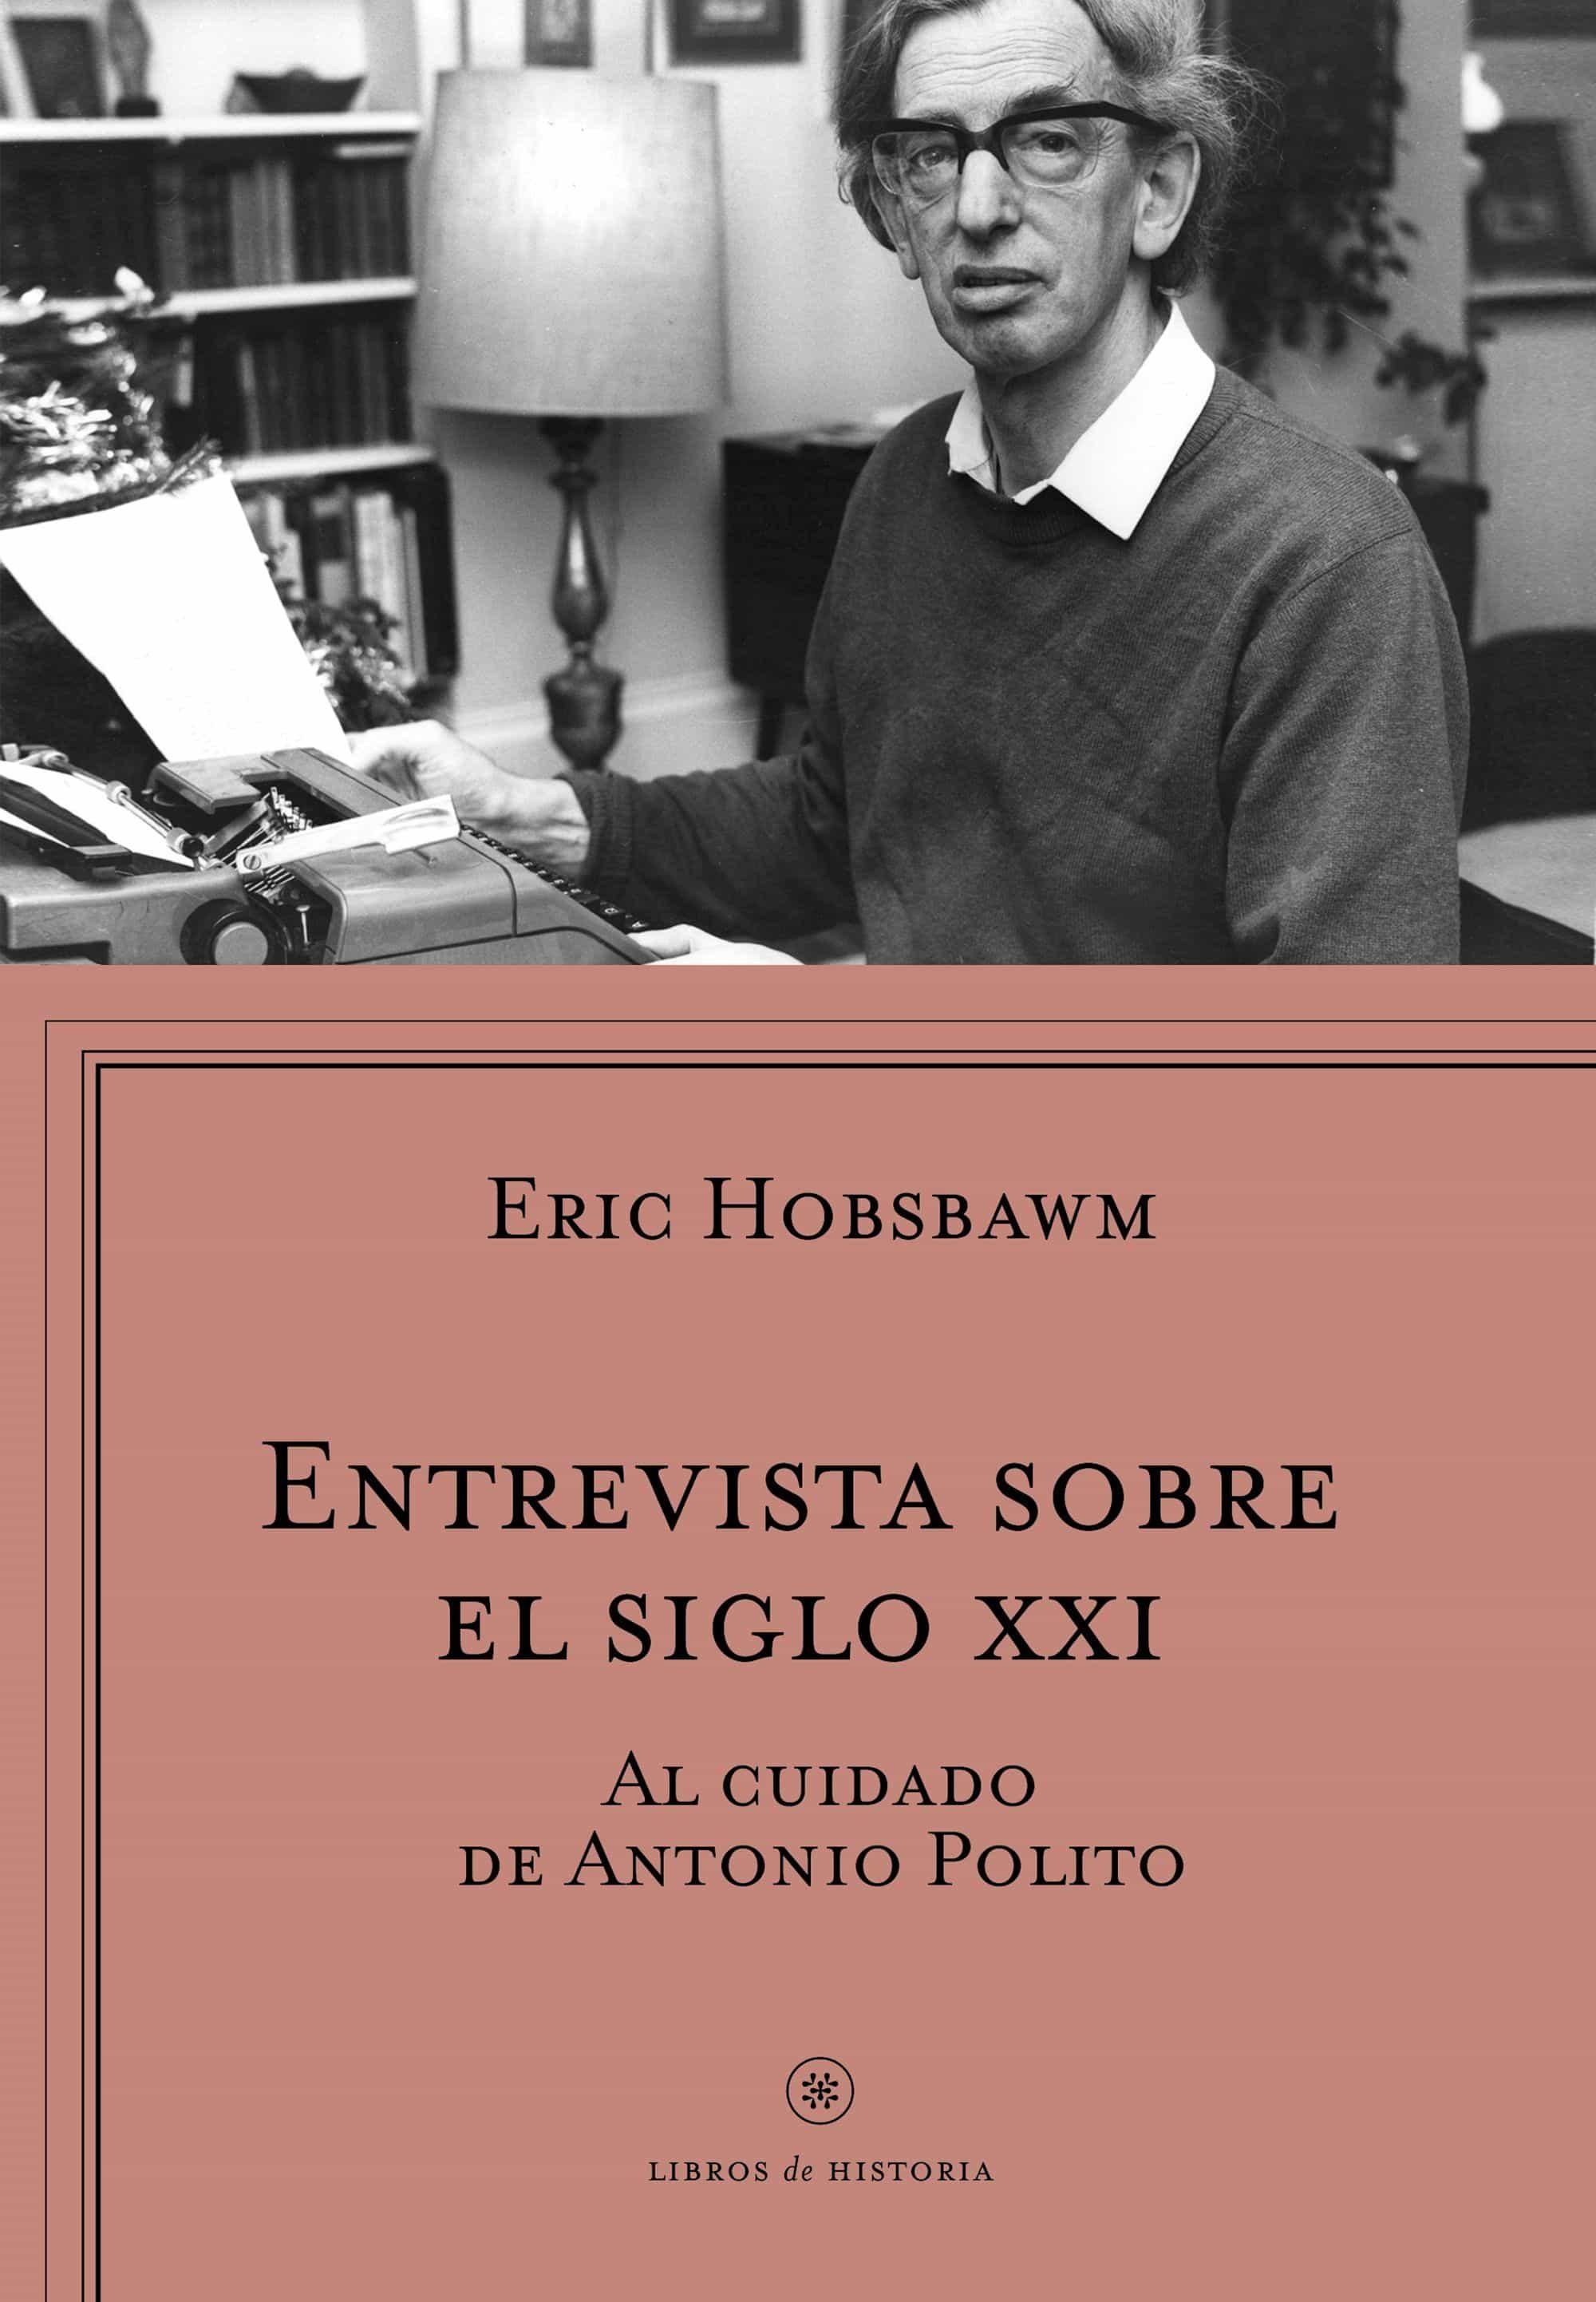 Entrevista Sobre El Siglo Xxi por Eric Hobsbawm